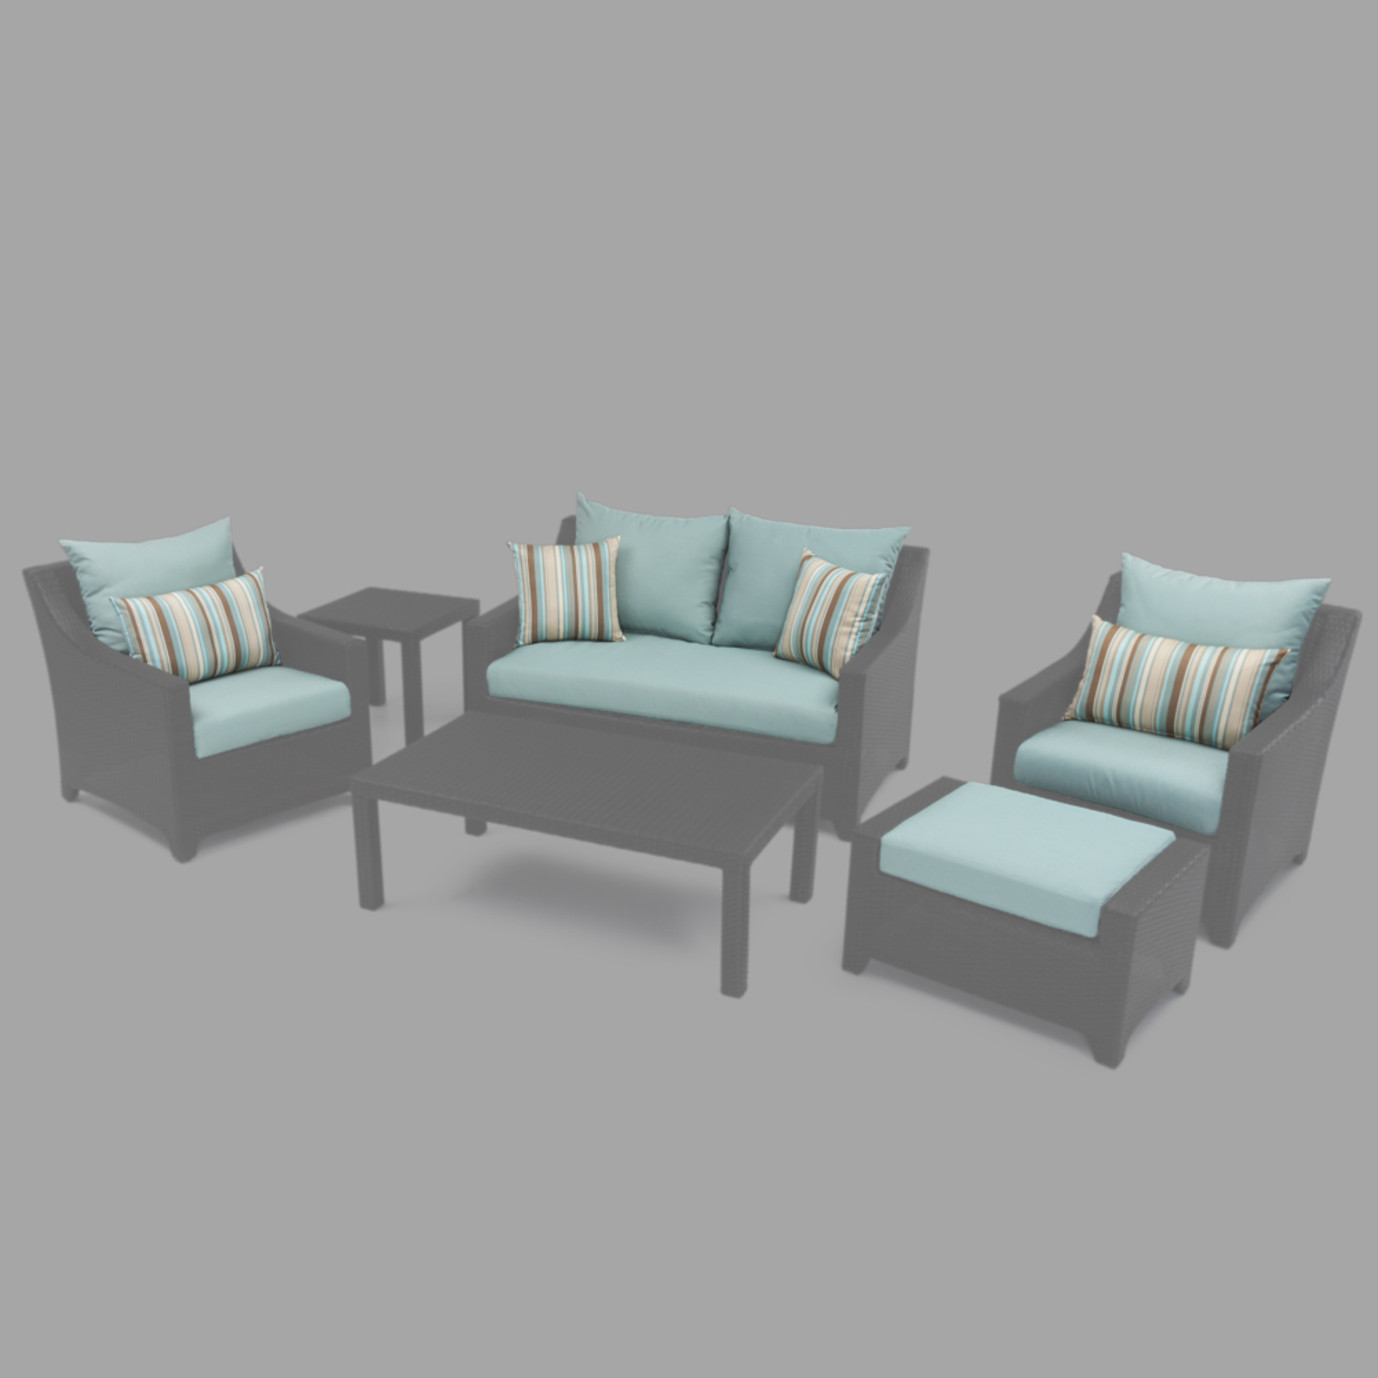 Modular Outdoor 6pc Love Cushion Cover Set - Bliss Blue